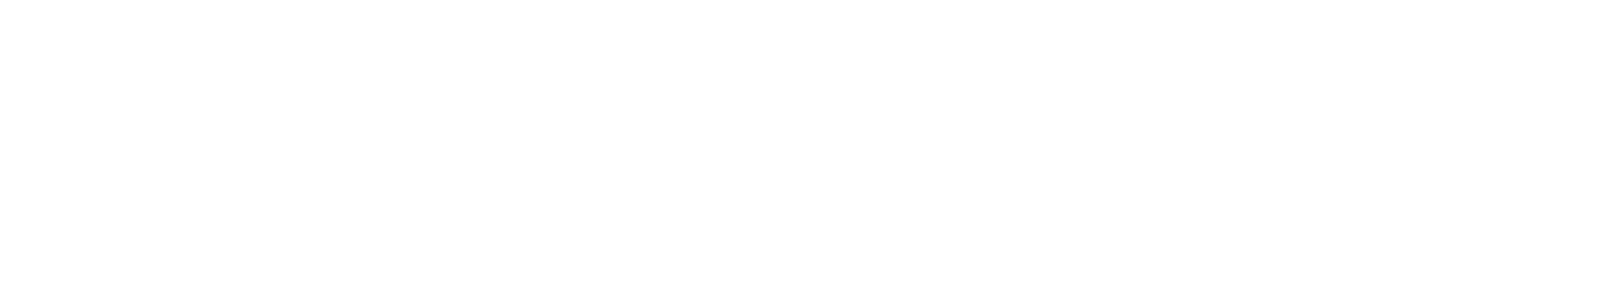 DLTC logo 2019 white-01